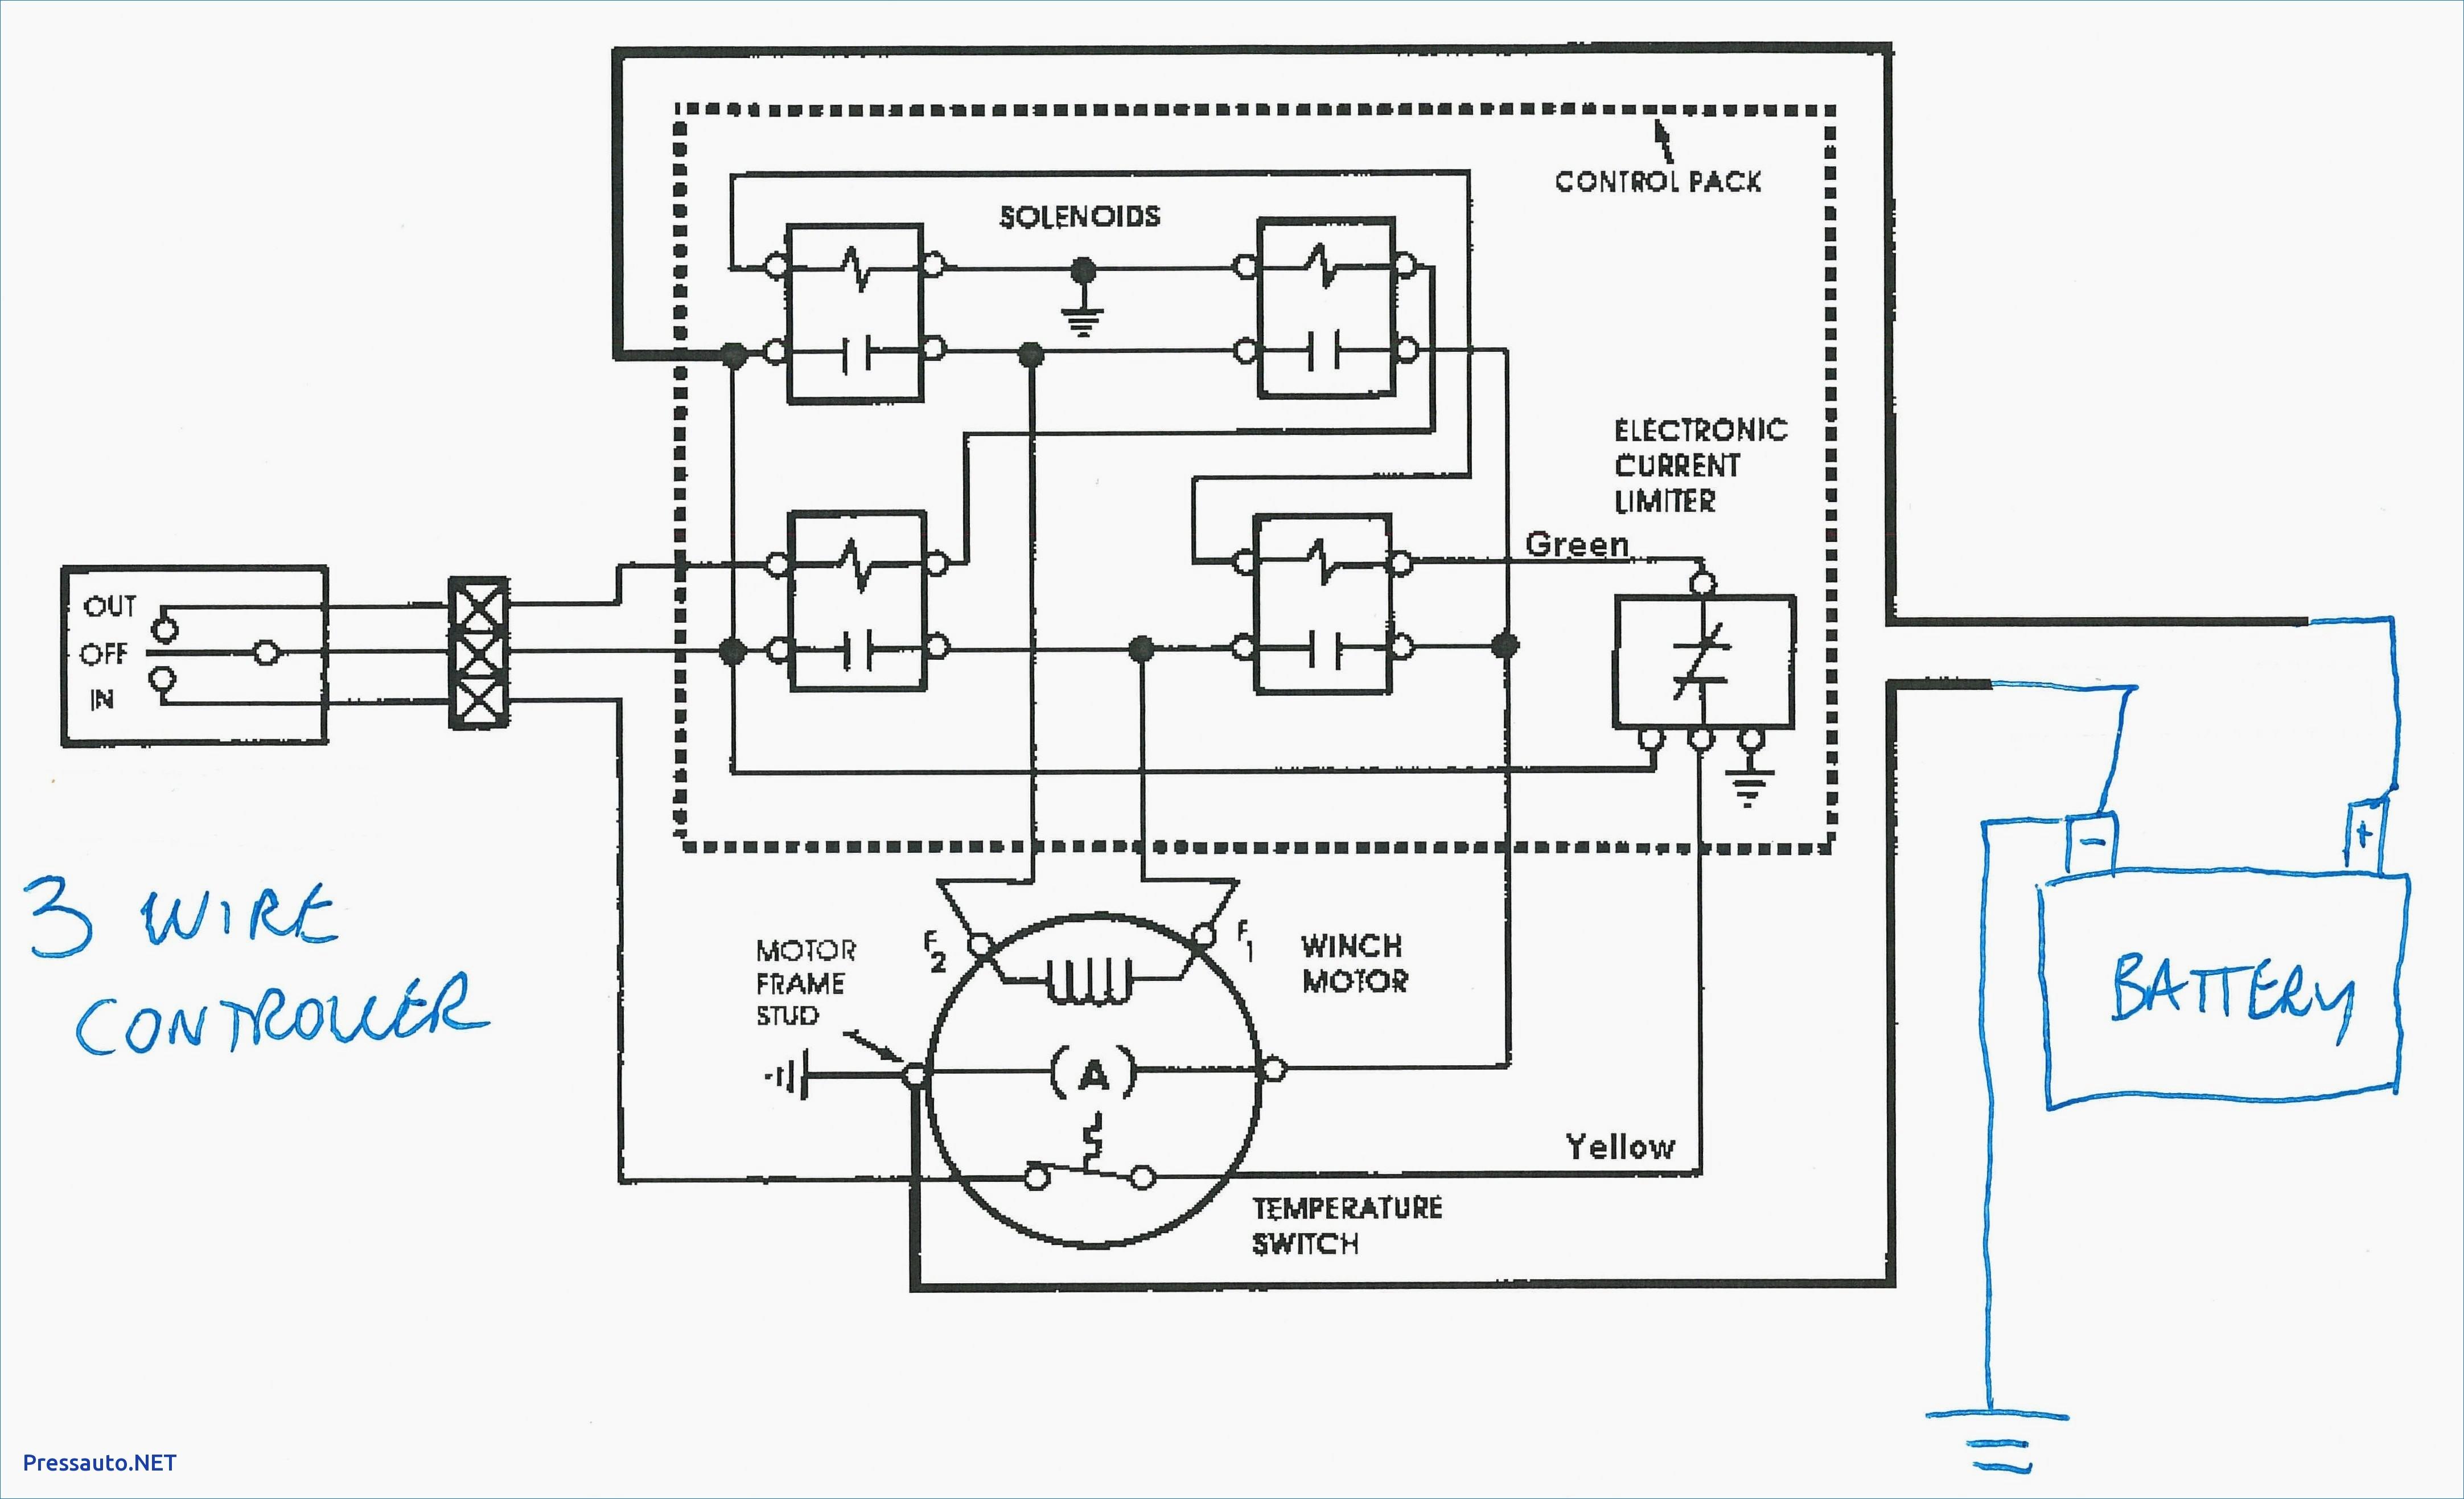 12v Starter solenoid Wiring Diagram Unique Pretty 12 Volt solenoid Wiring Diagram Electrical and